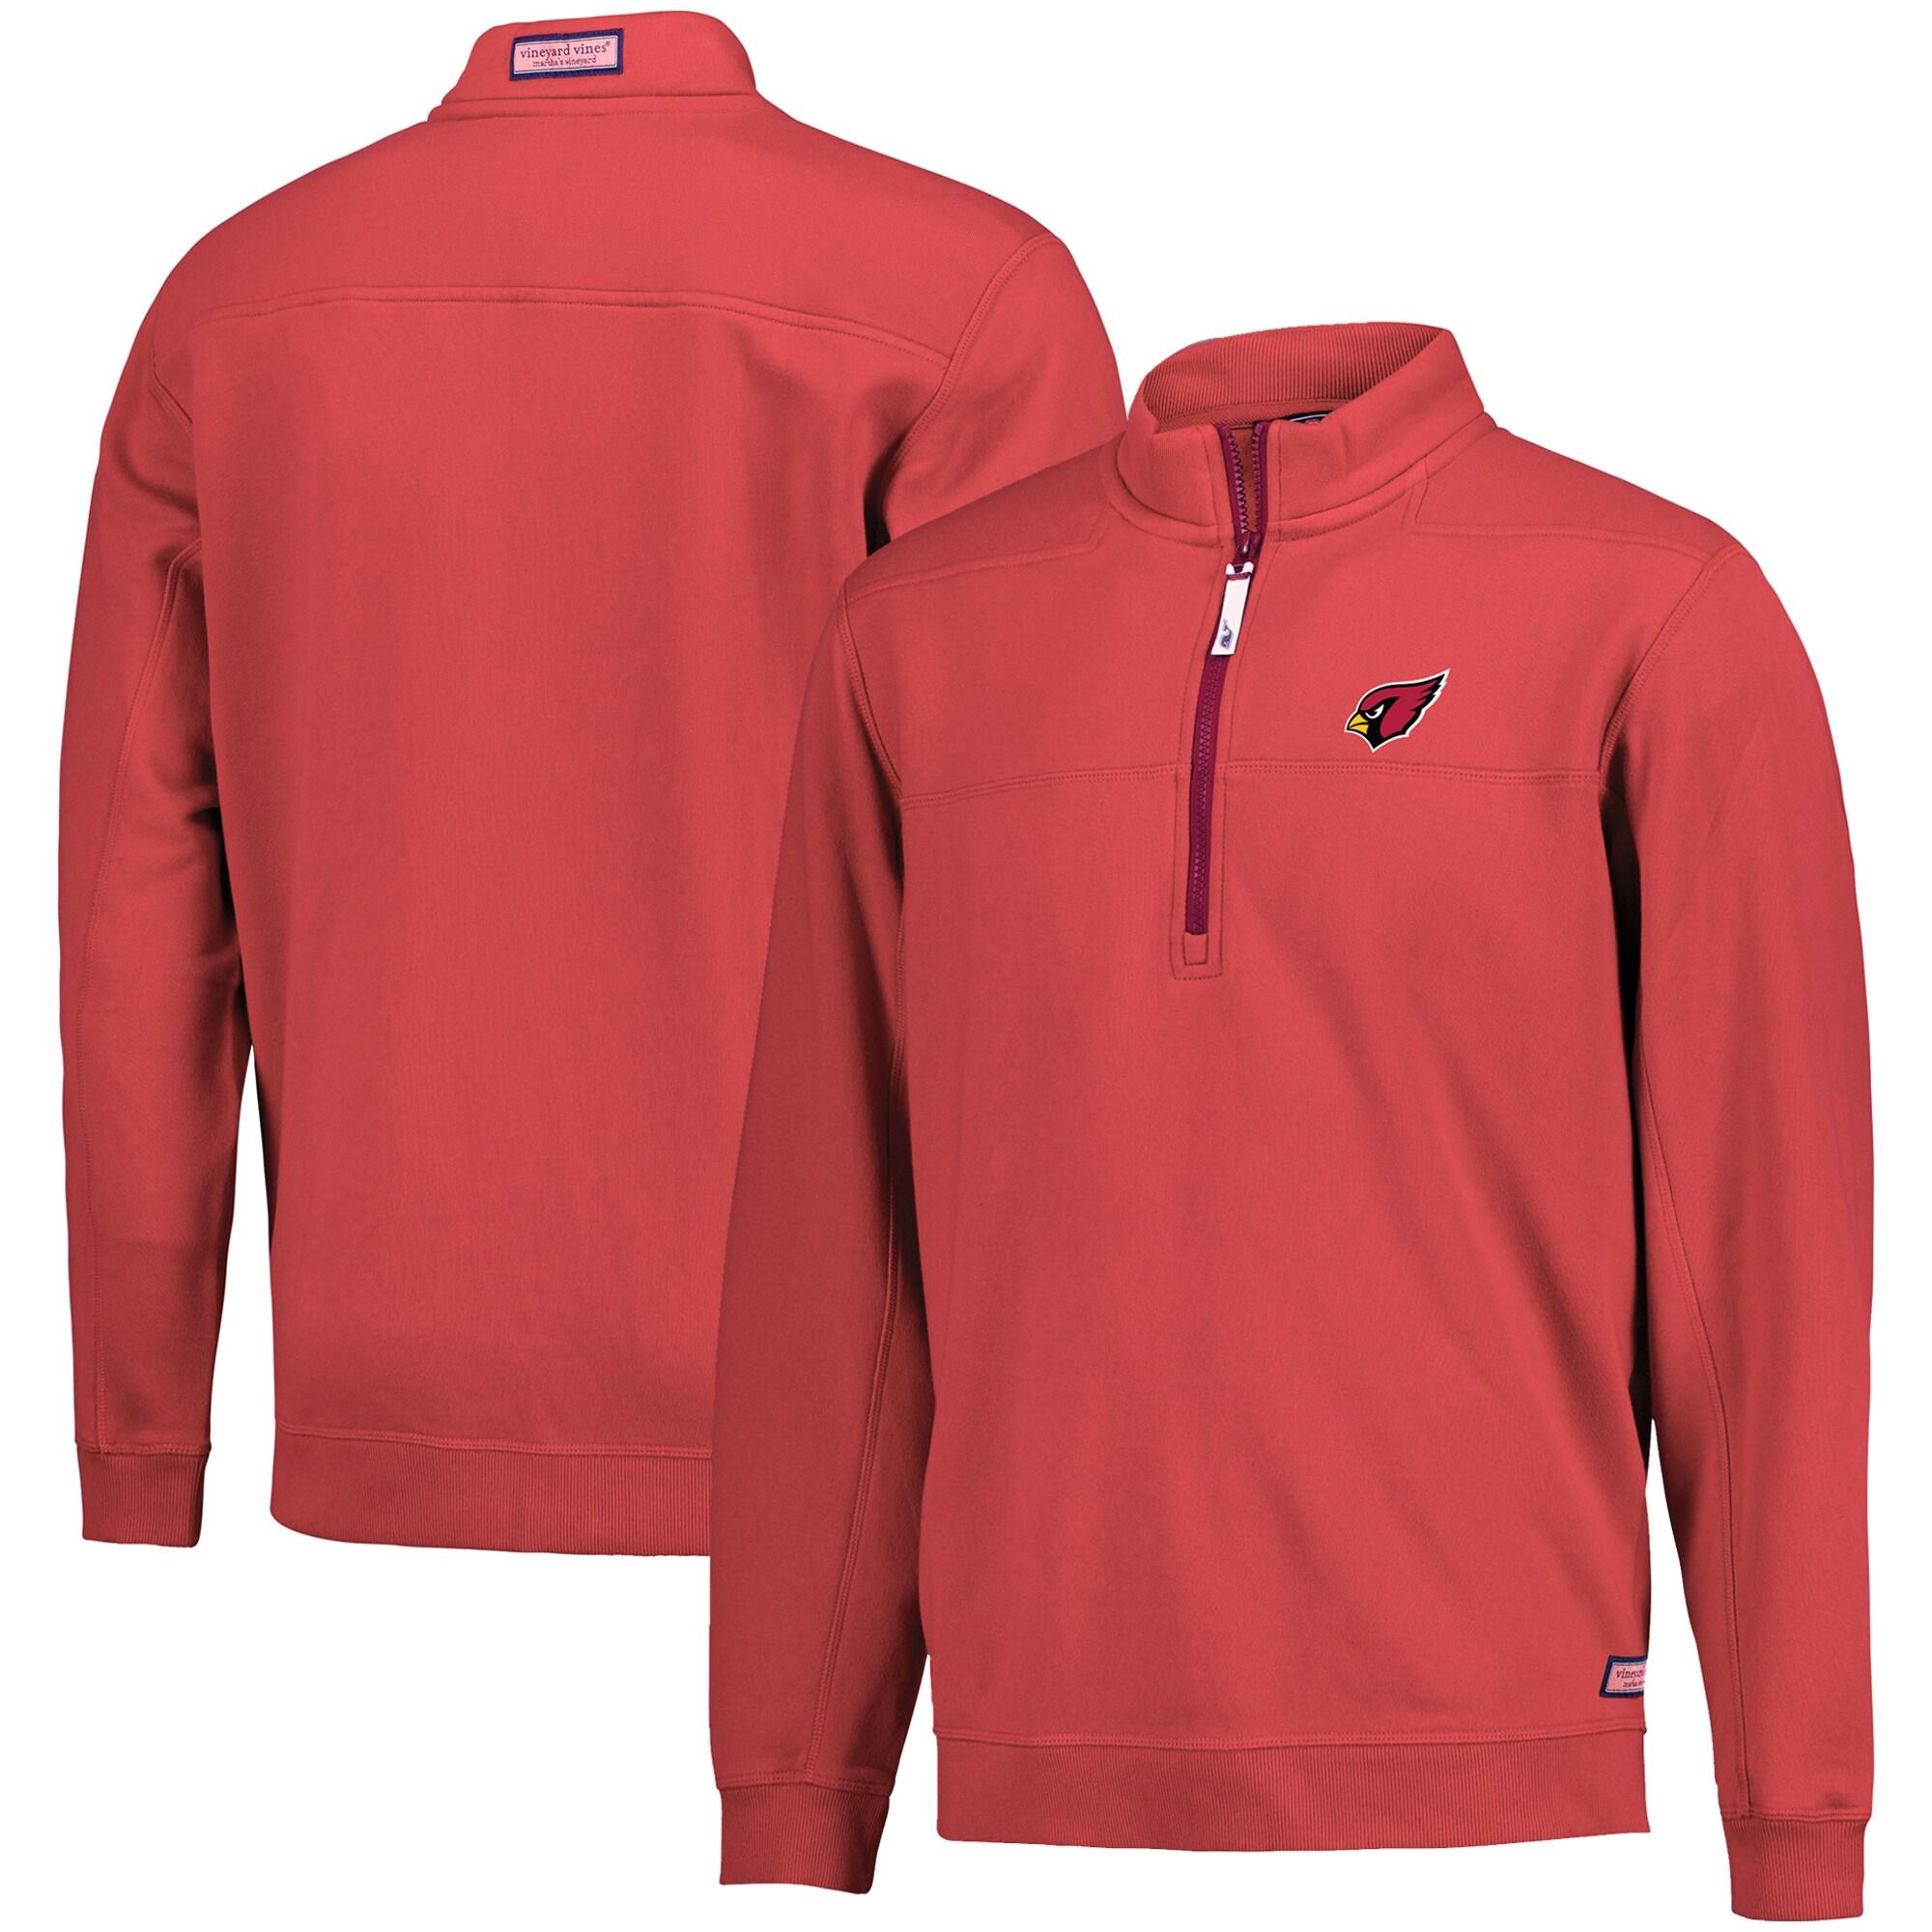 Arizona Cardinals Vineyard Vines Collegiate Shep Shirt Quarter-Zip Pullover Jacket - Cardinal